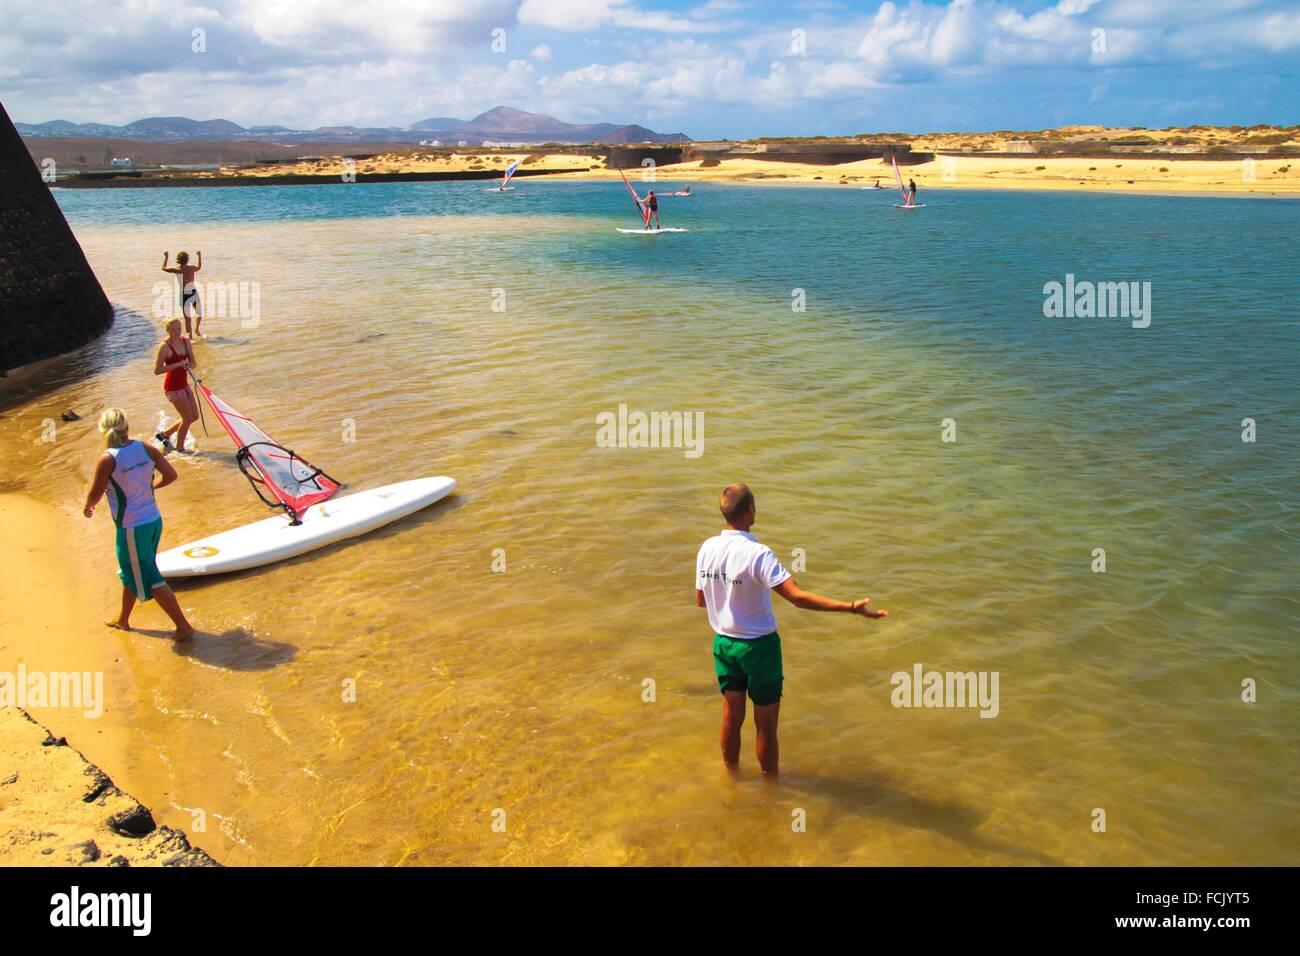 Sports and Leisure activities in La Santa Club in Tinajo municipality. Lanzarote island - Stock Image